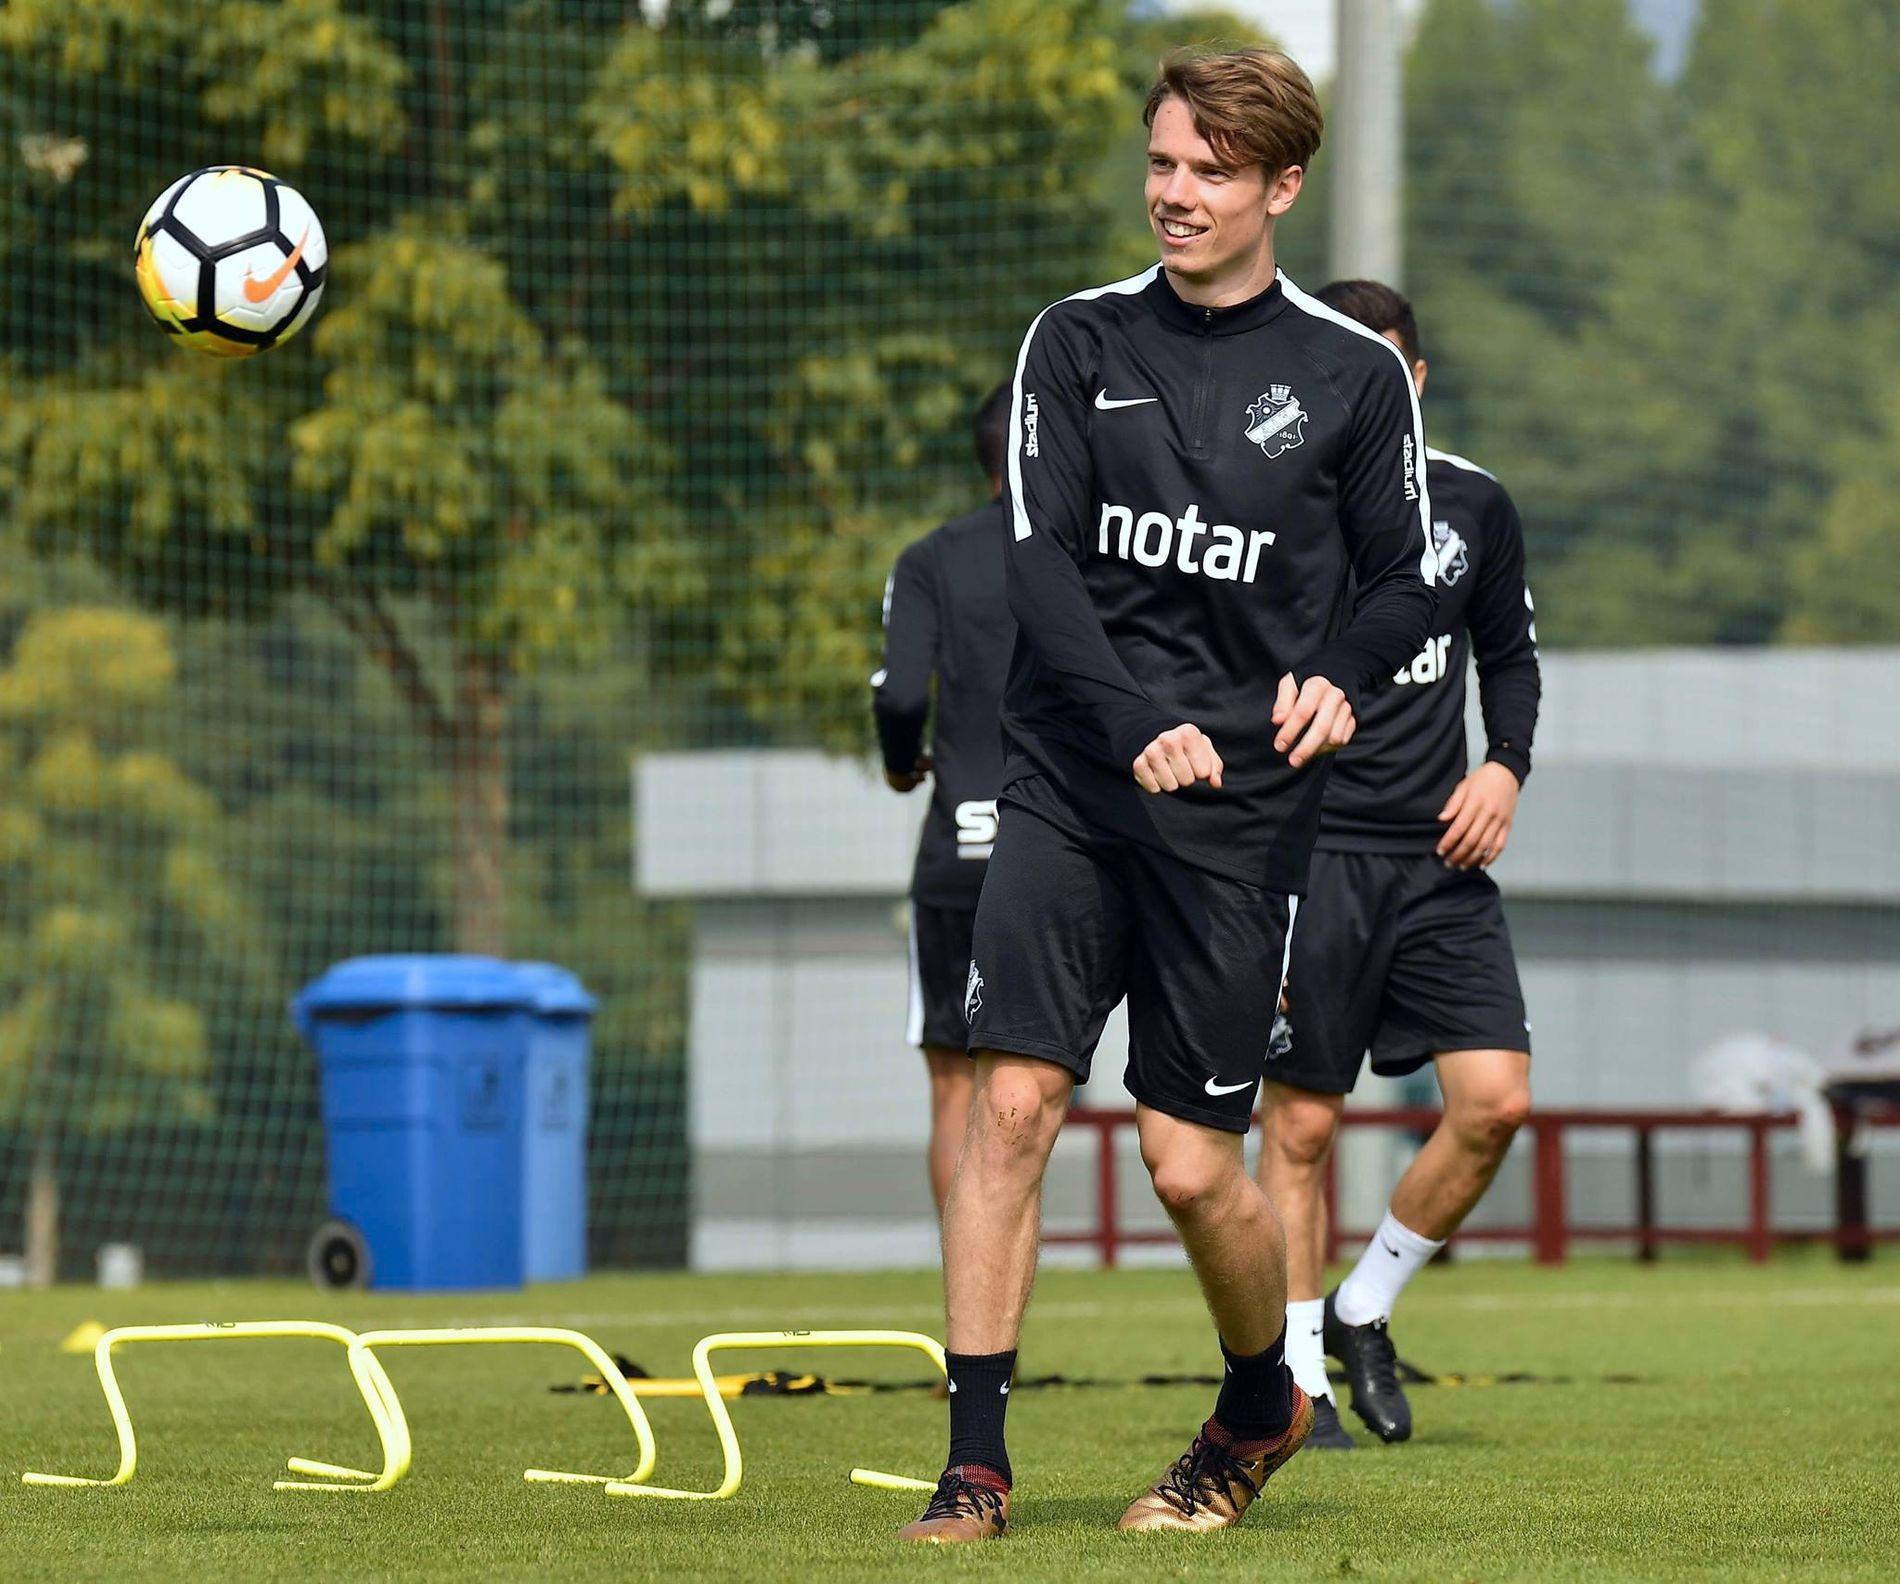 DRAR FRA STOCKHOLM: Robert Taylor går på lån fra AIK til Tromsø.